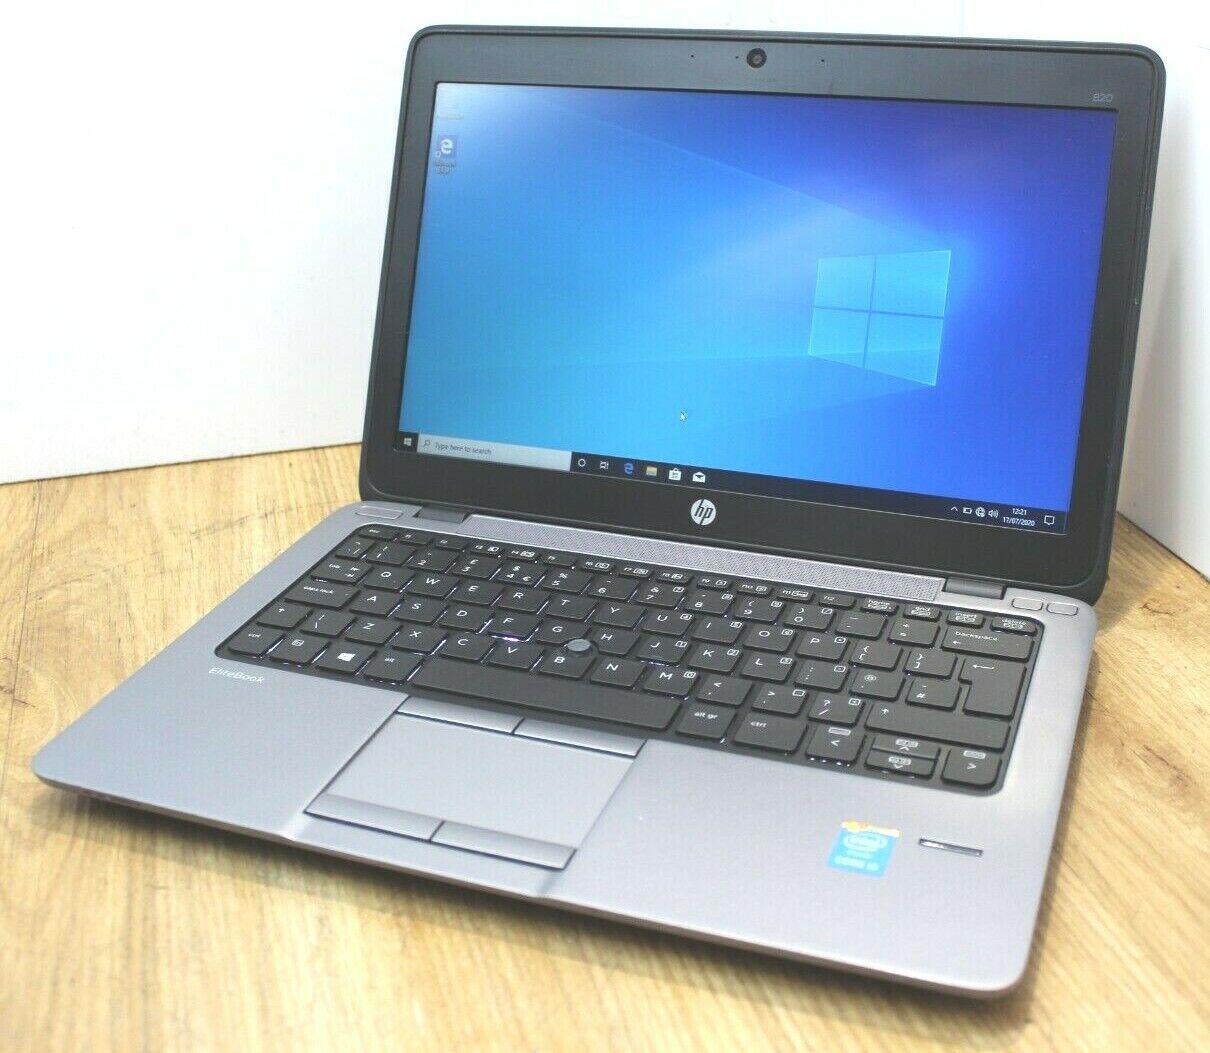 Laptop Windows - HP Elitebook 820 G1 Windows 10 Laptop Intel Core i5 4th Gen 1.7GHz 4GB 320GB HDD